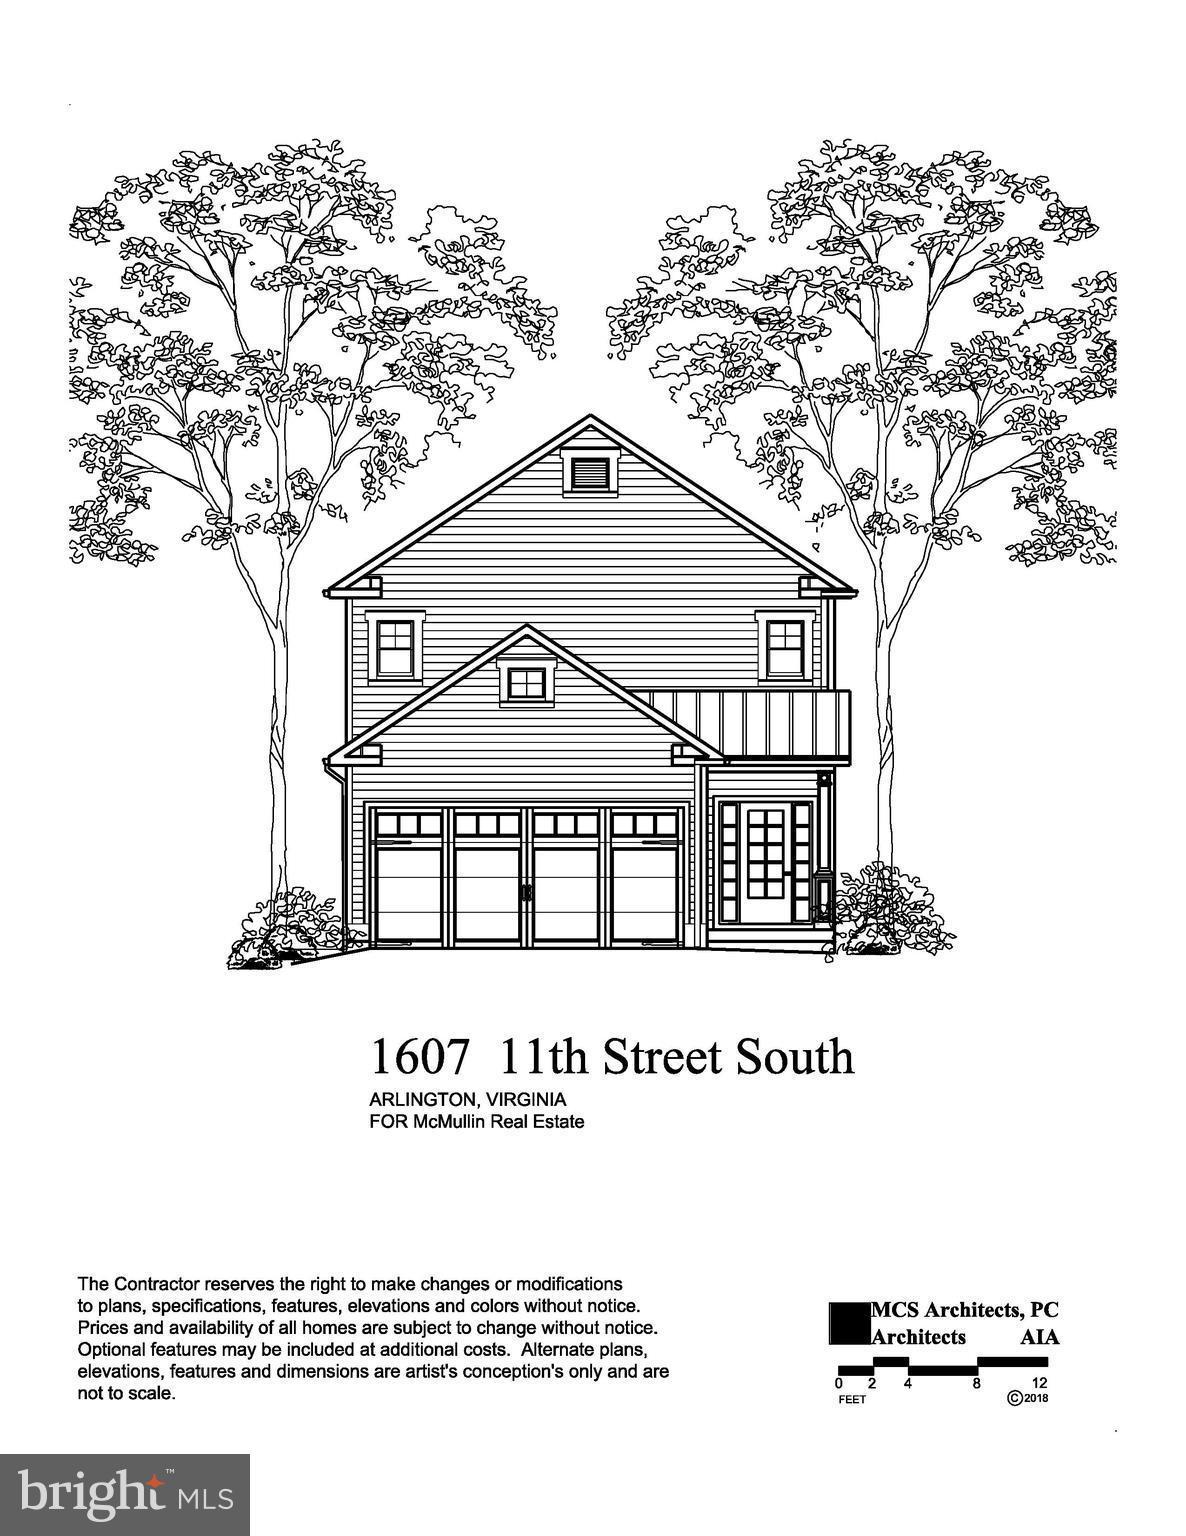 1607 11TH STREET S, ARLINGTON, VA 22204